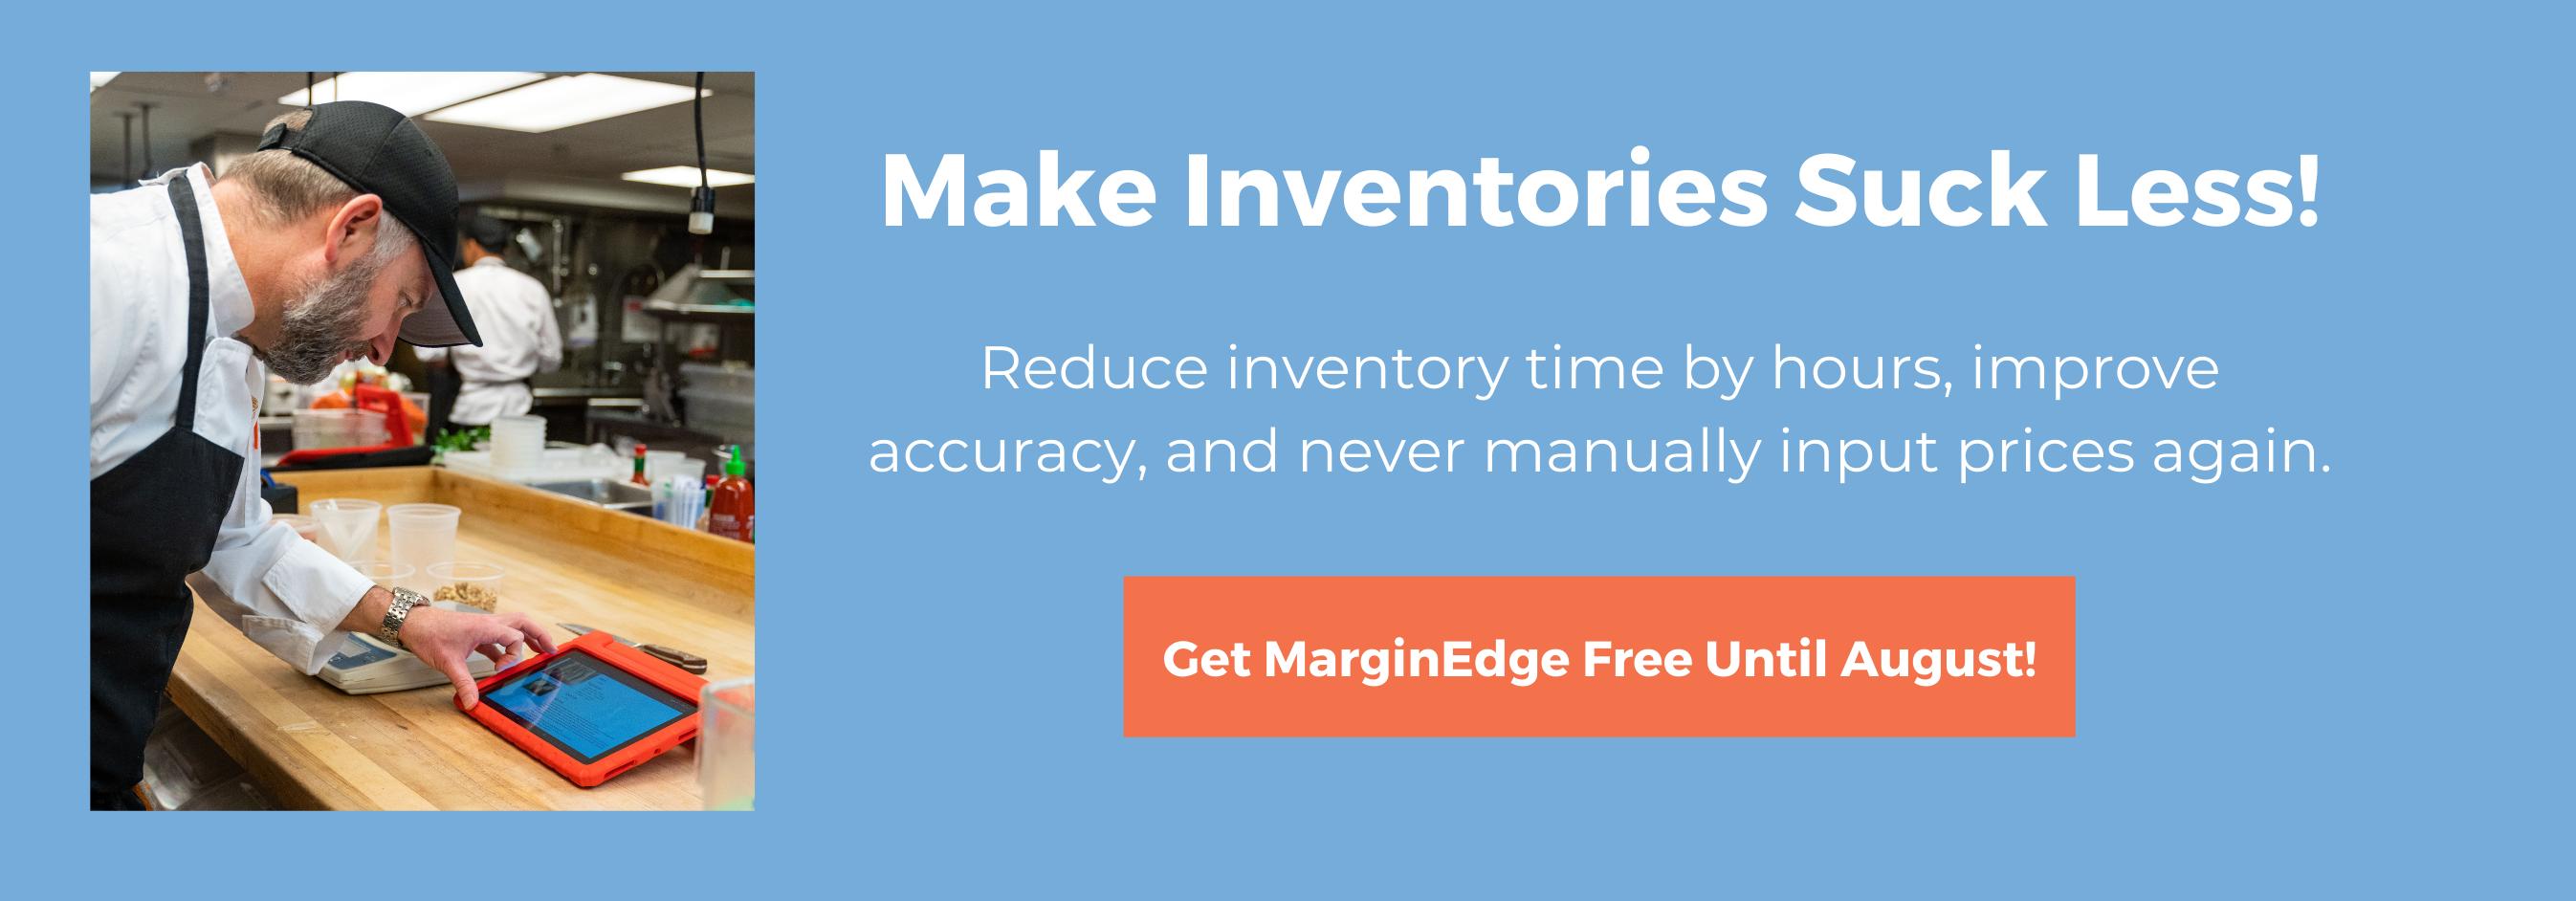 Improve Your Inventories